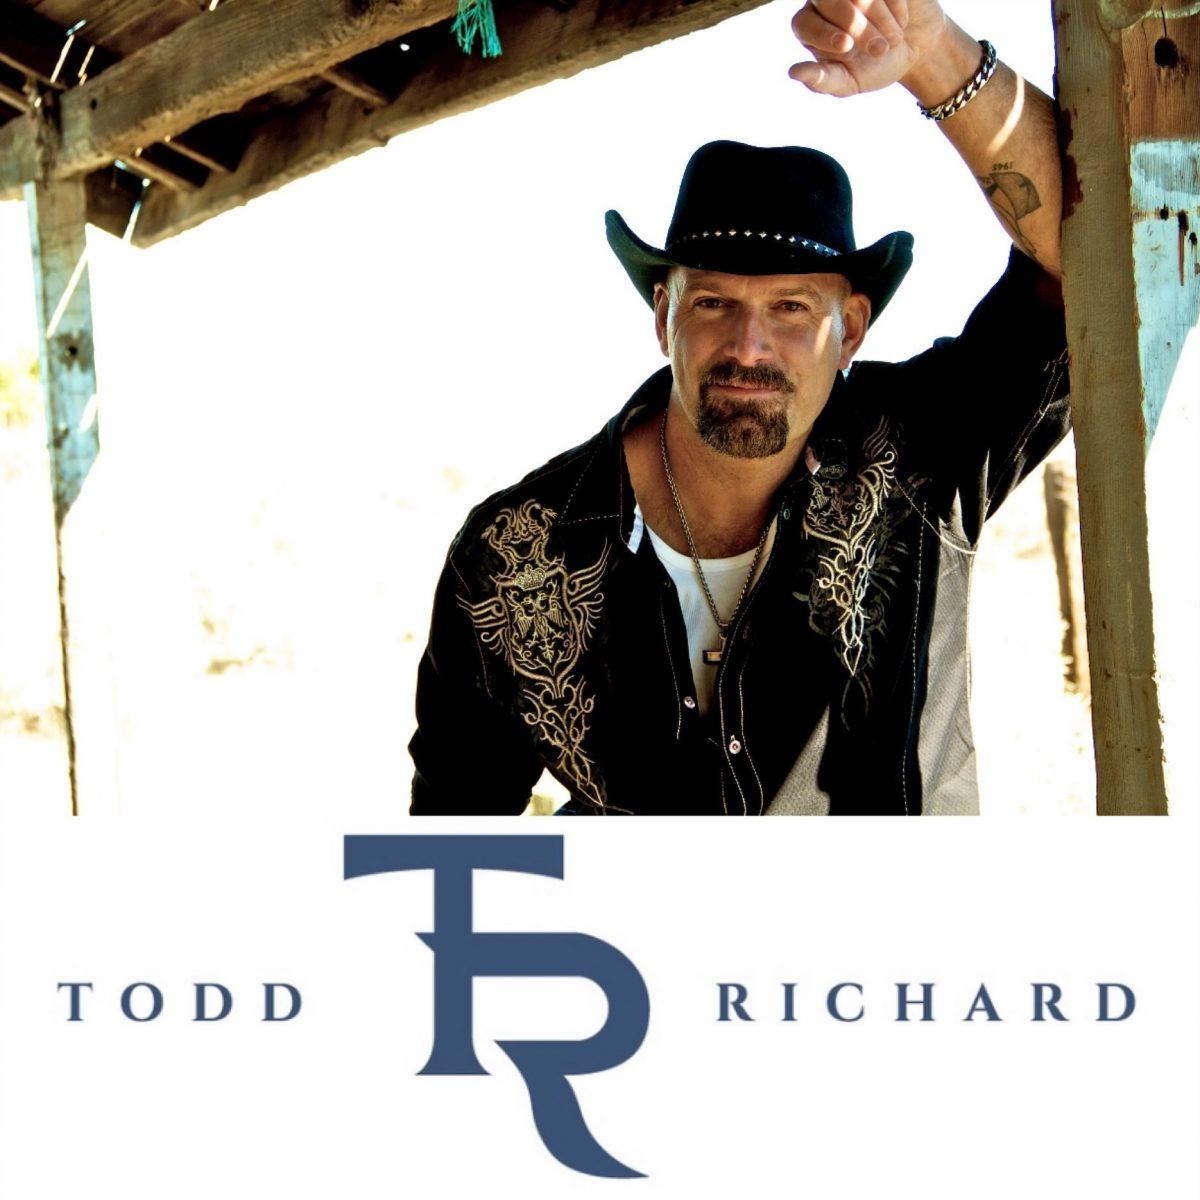 todd richard music